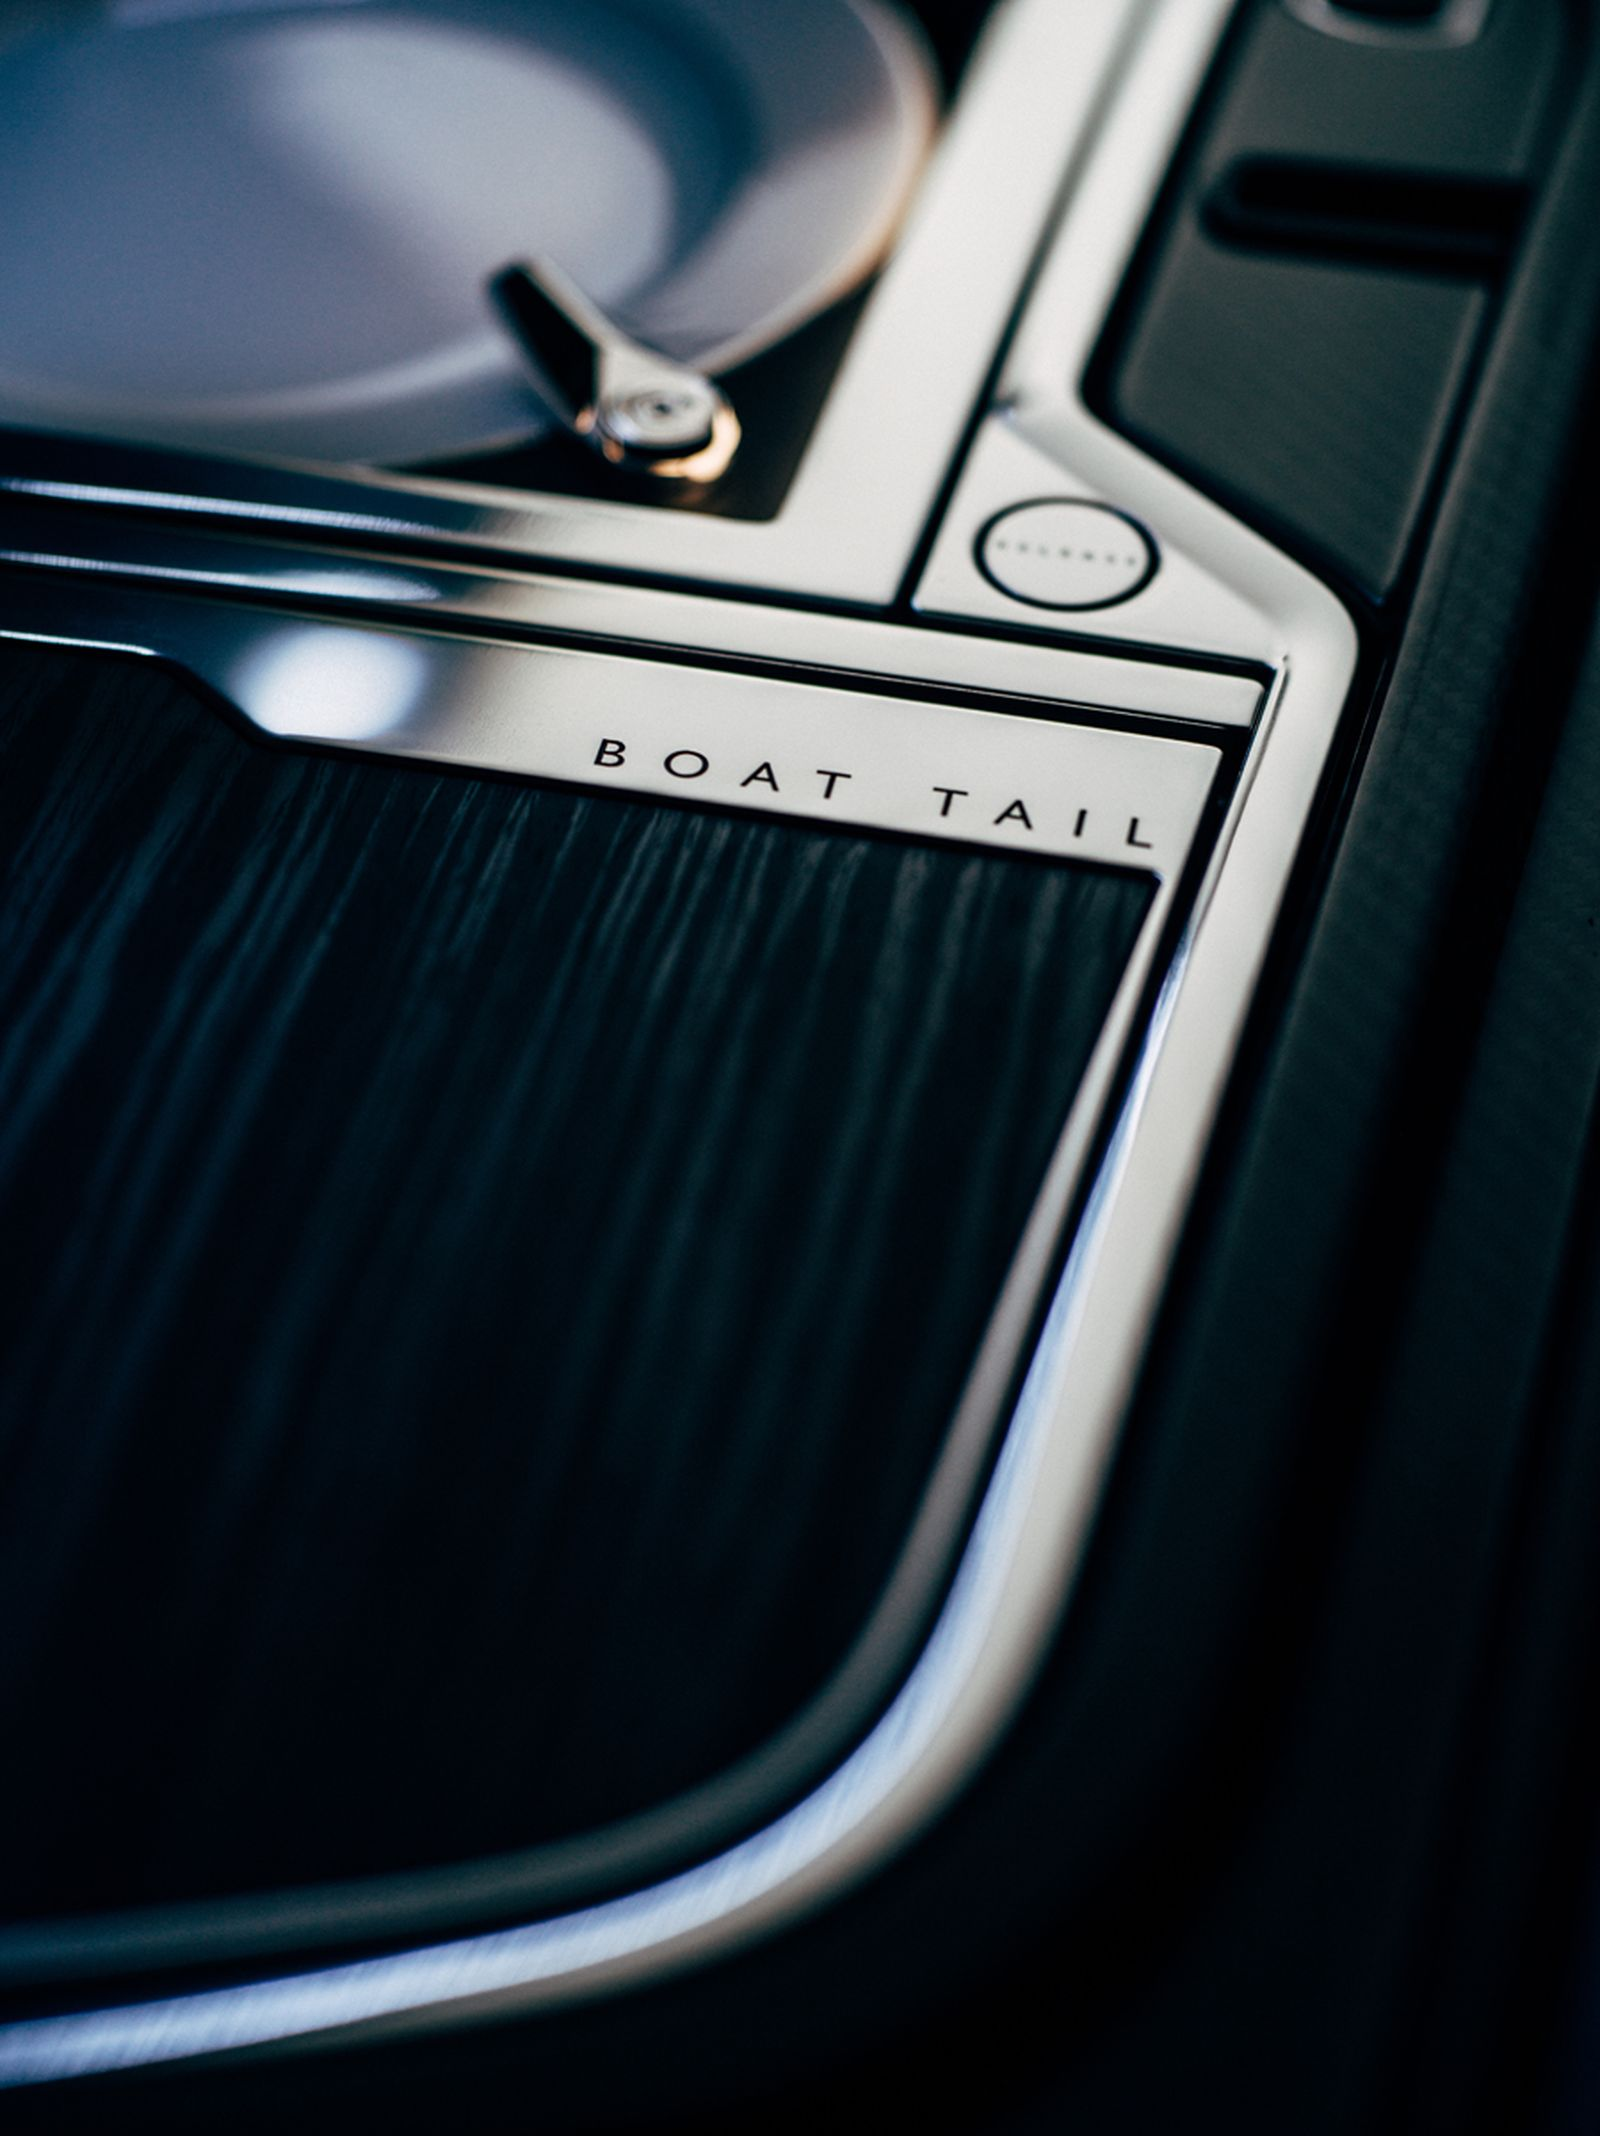 Rolls-Royce-Boat-Tail-coachbuild-car (3)